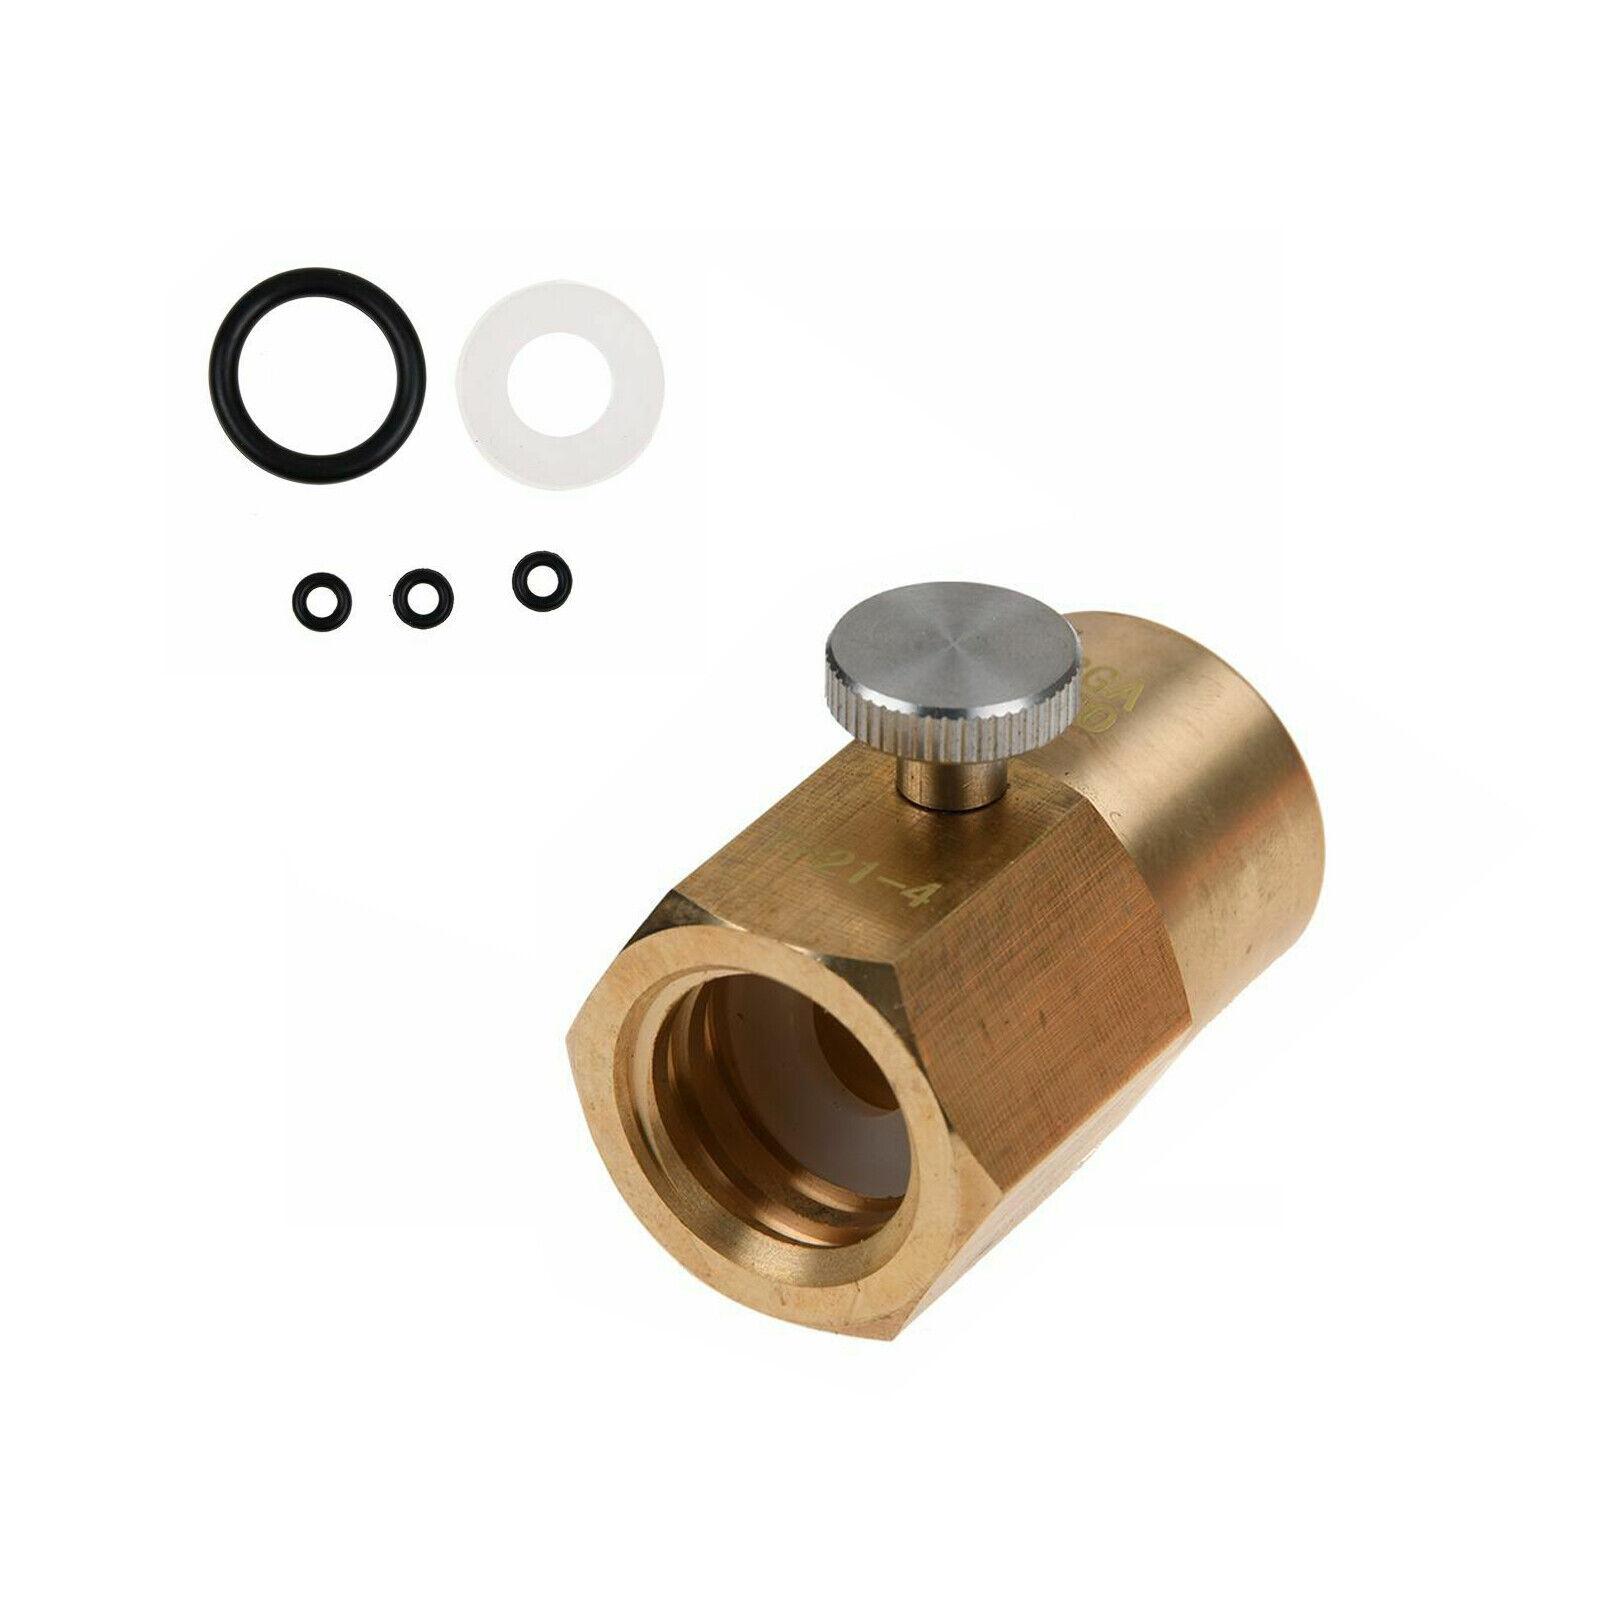 Für Sodastream Cylinder Refill Adapter TR21-4 Auf CGA 320 Connector Kit